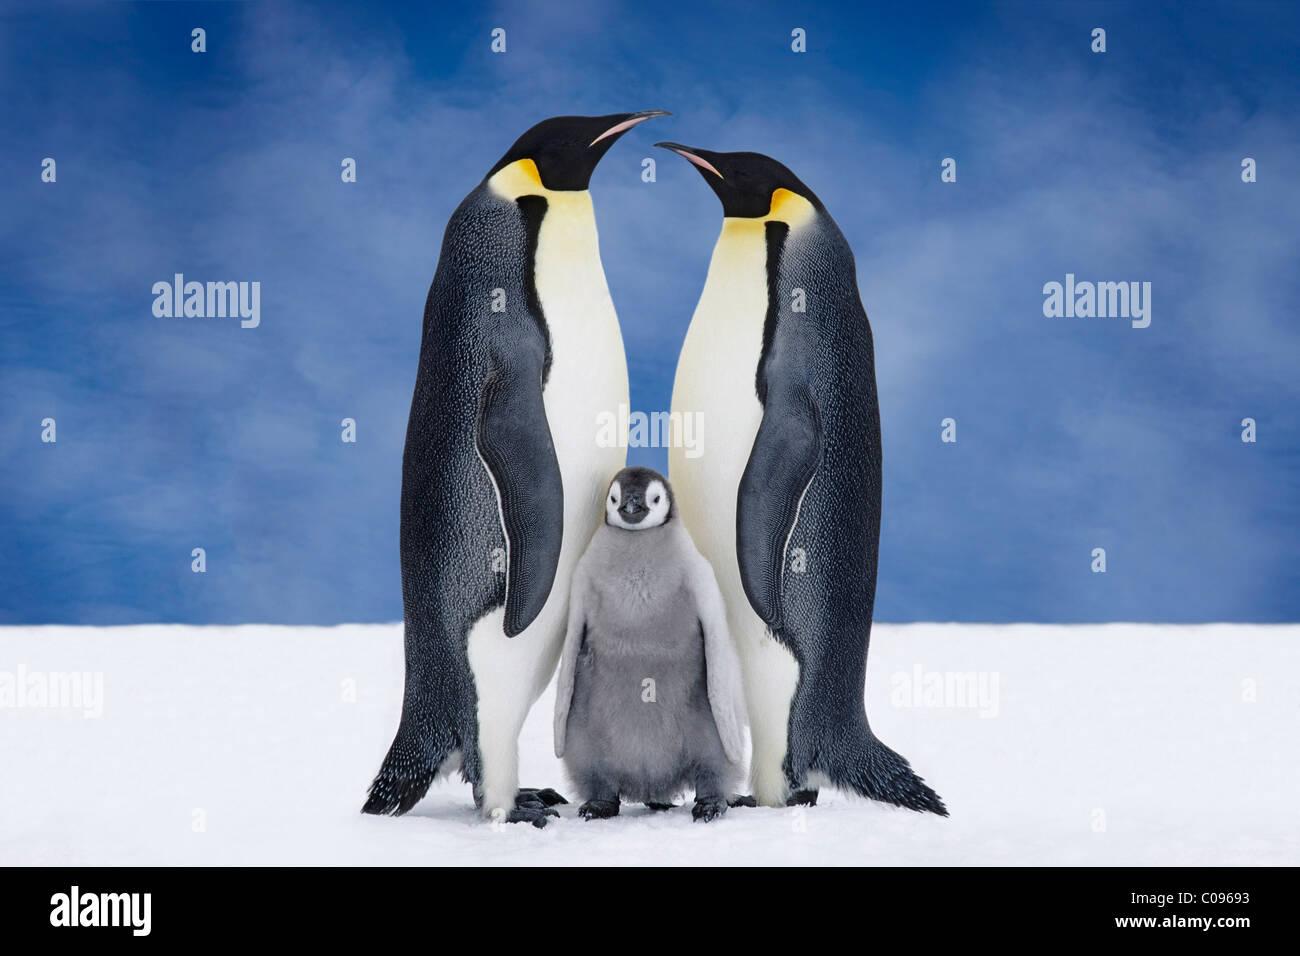 Porträt von Kaiser-Pinguin-Eltern & Küken, Atka Bucht, Antarktis, COMPOSITE Stockbild